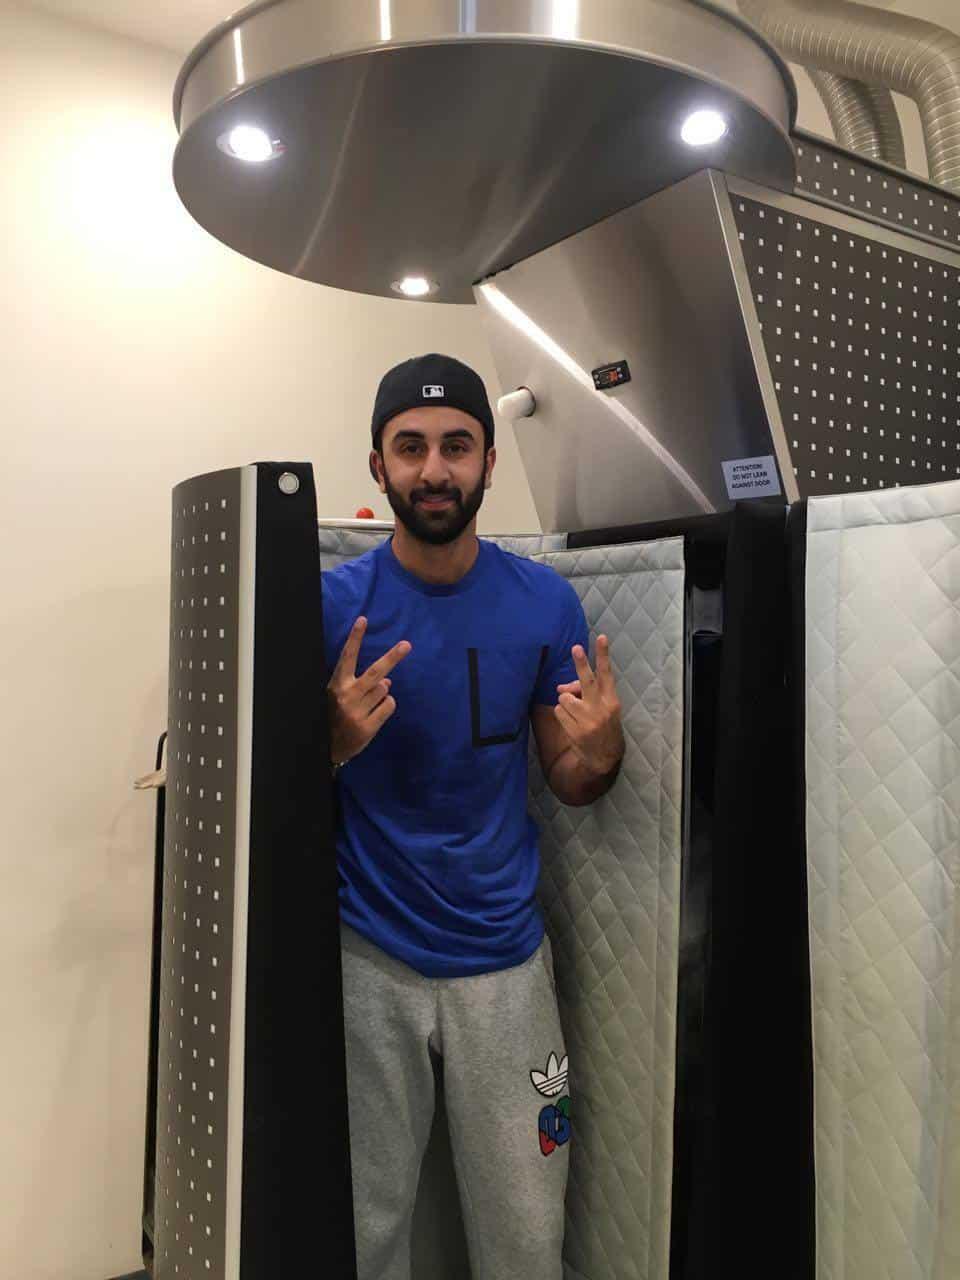 Bollywood Superstar at Alchemy Cryochamber